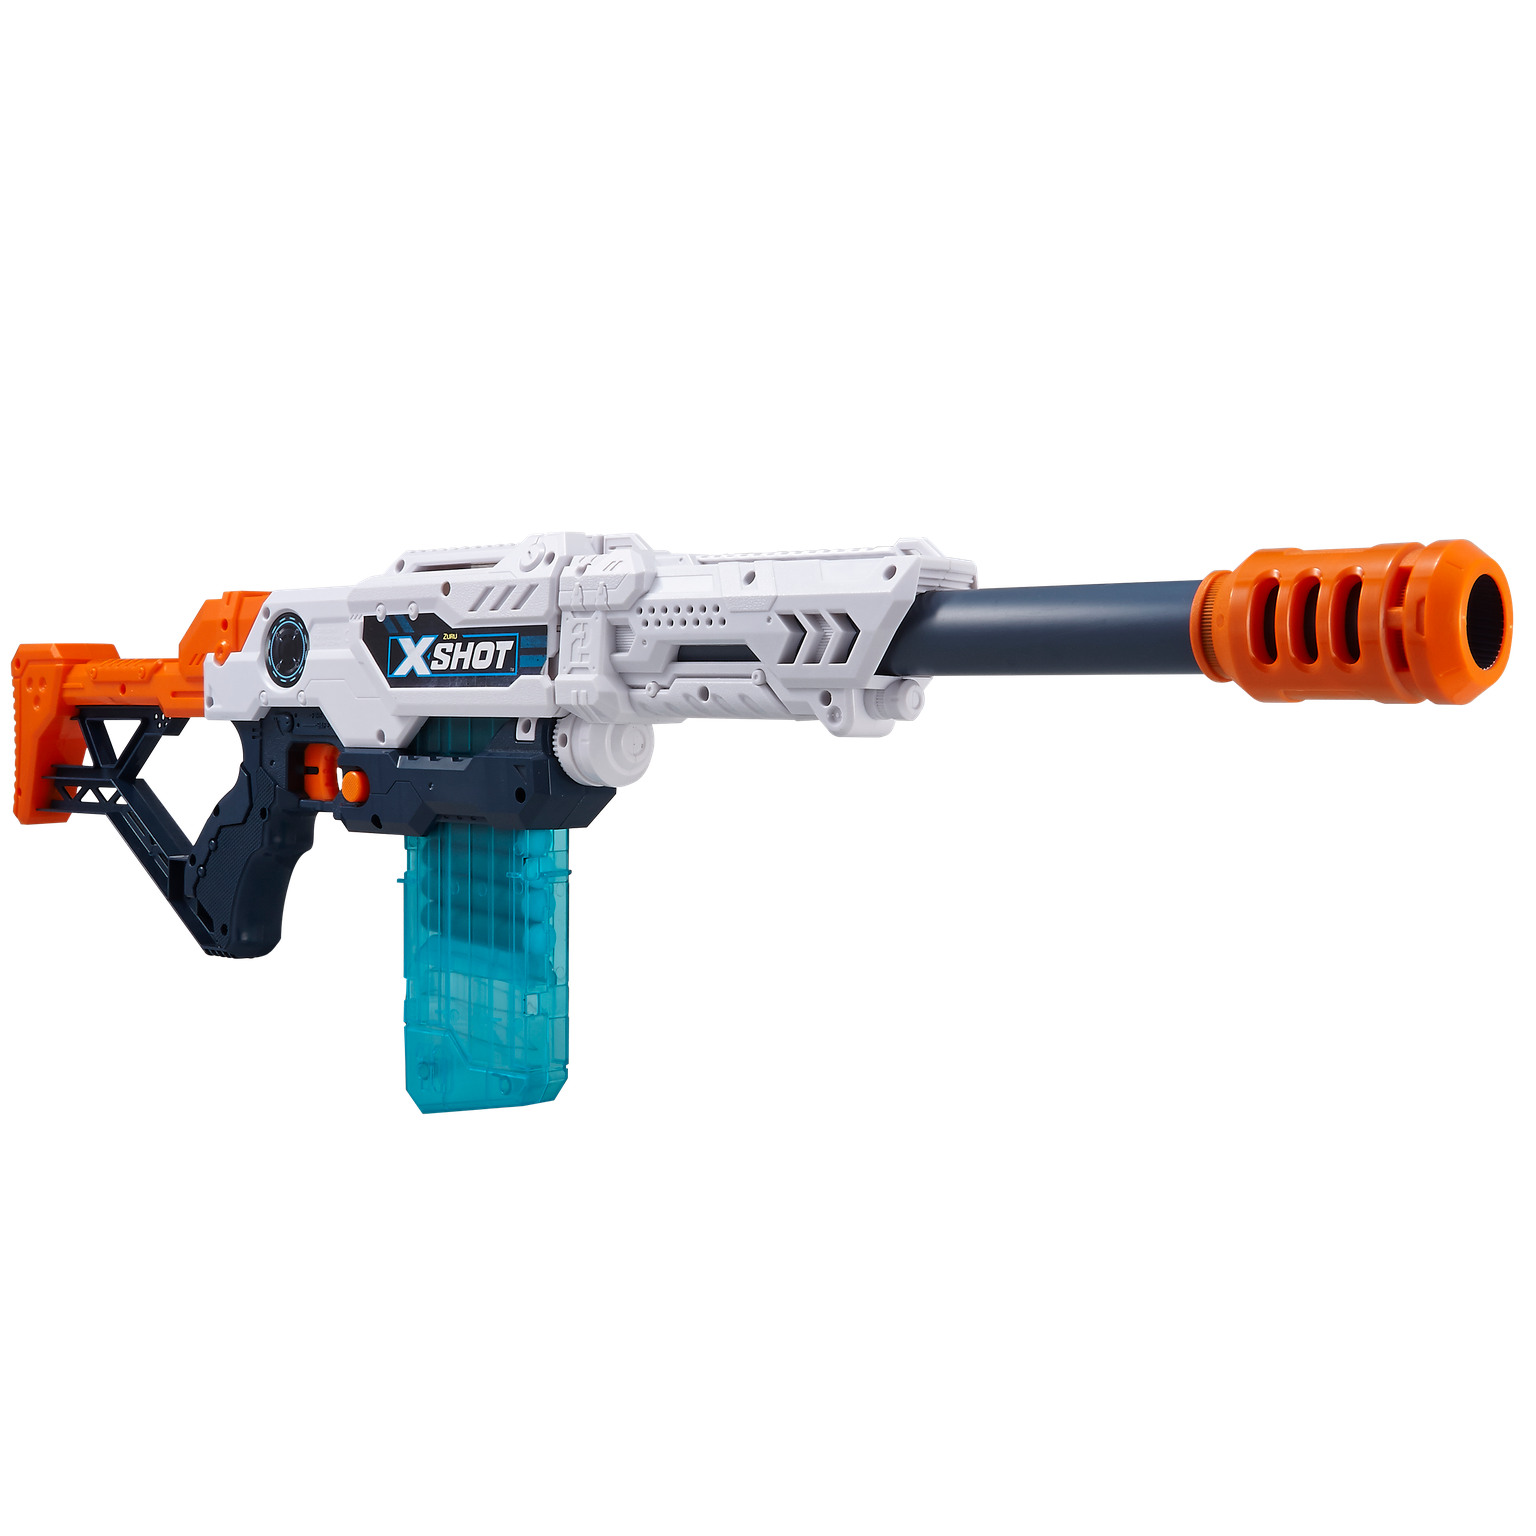 X-shot - Max Attack Large w/24 Darts (20124)